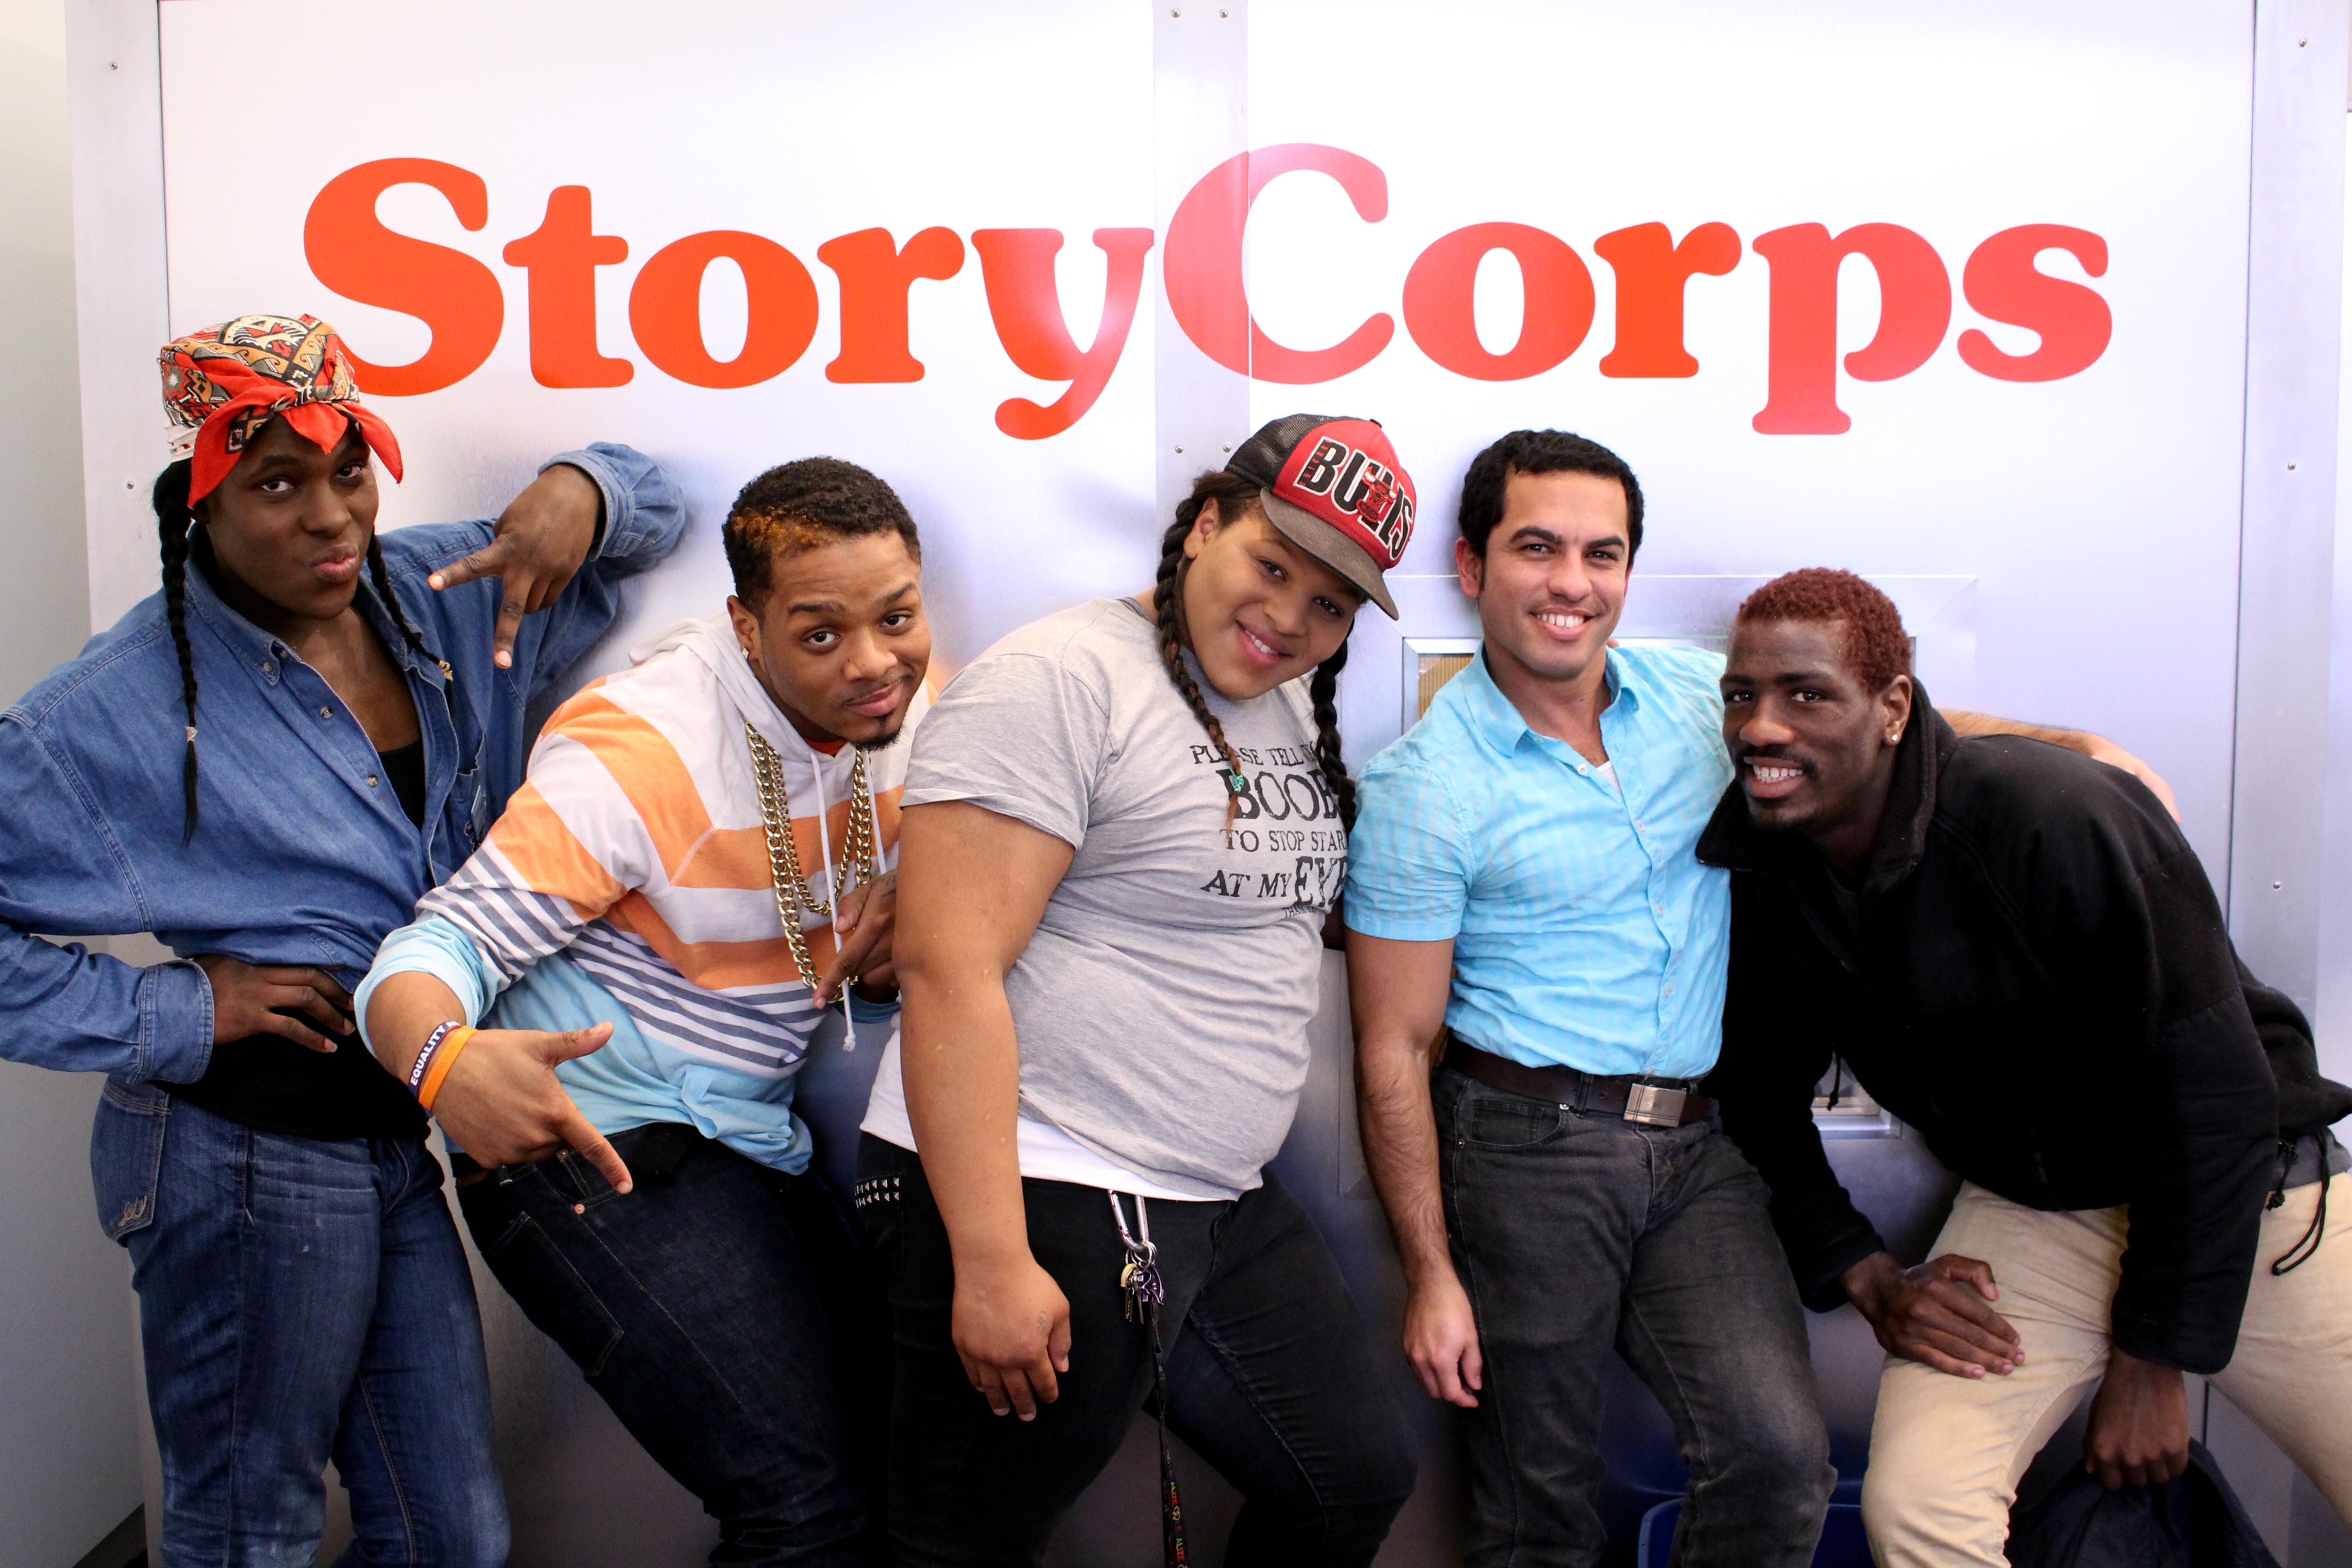 StoryCorps2014